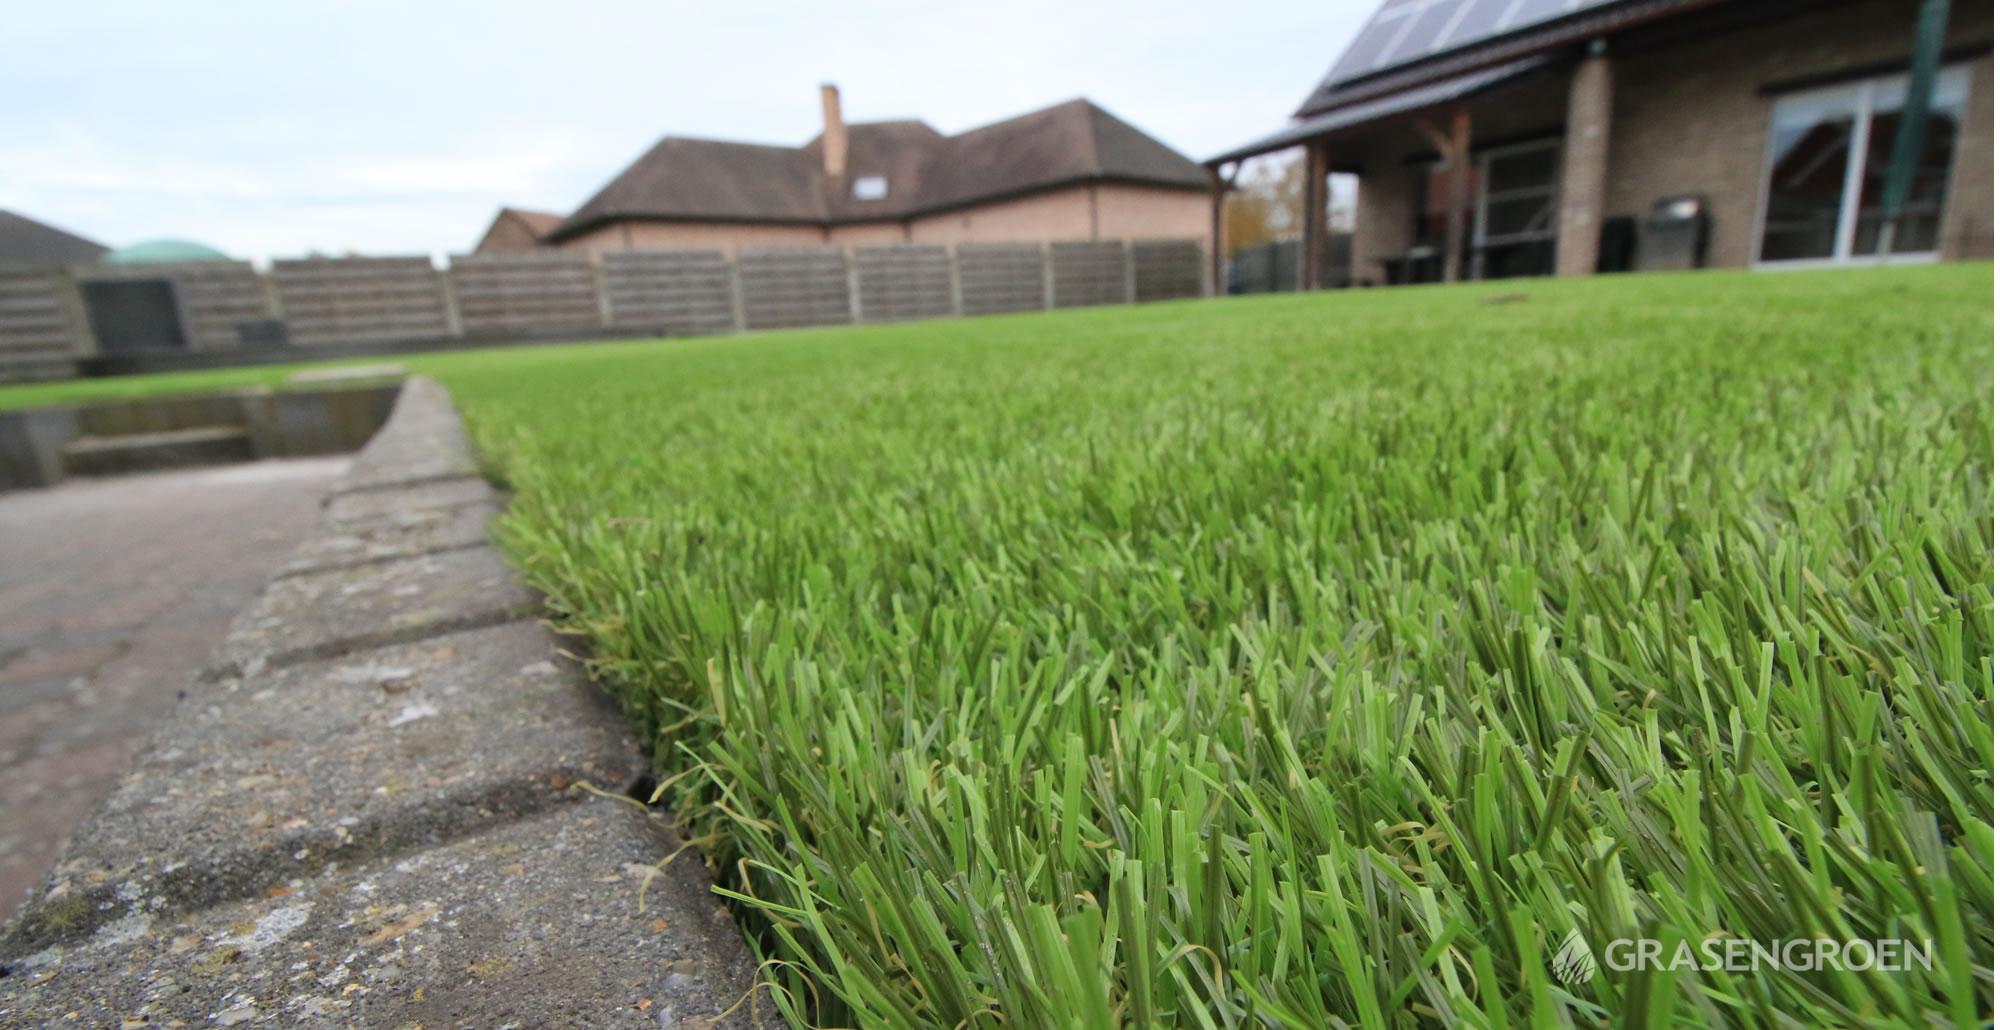 Kunstgrasleggenzelem14 • Gras en Groen Kunstgras